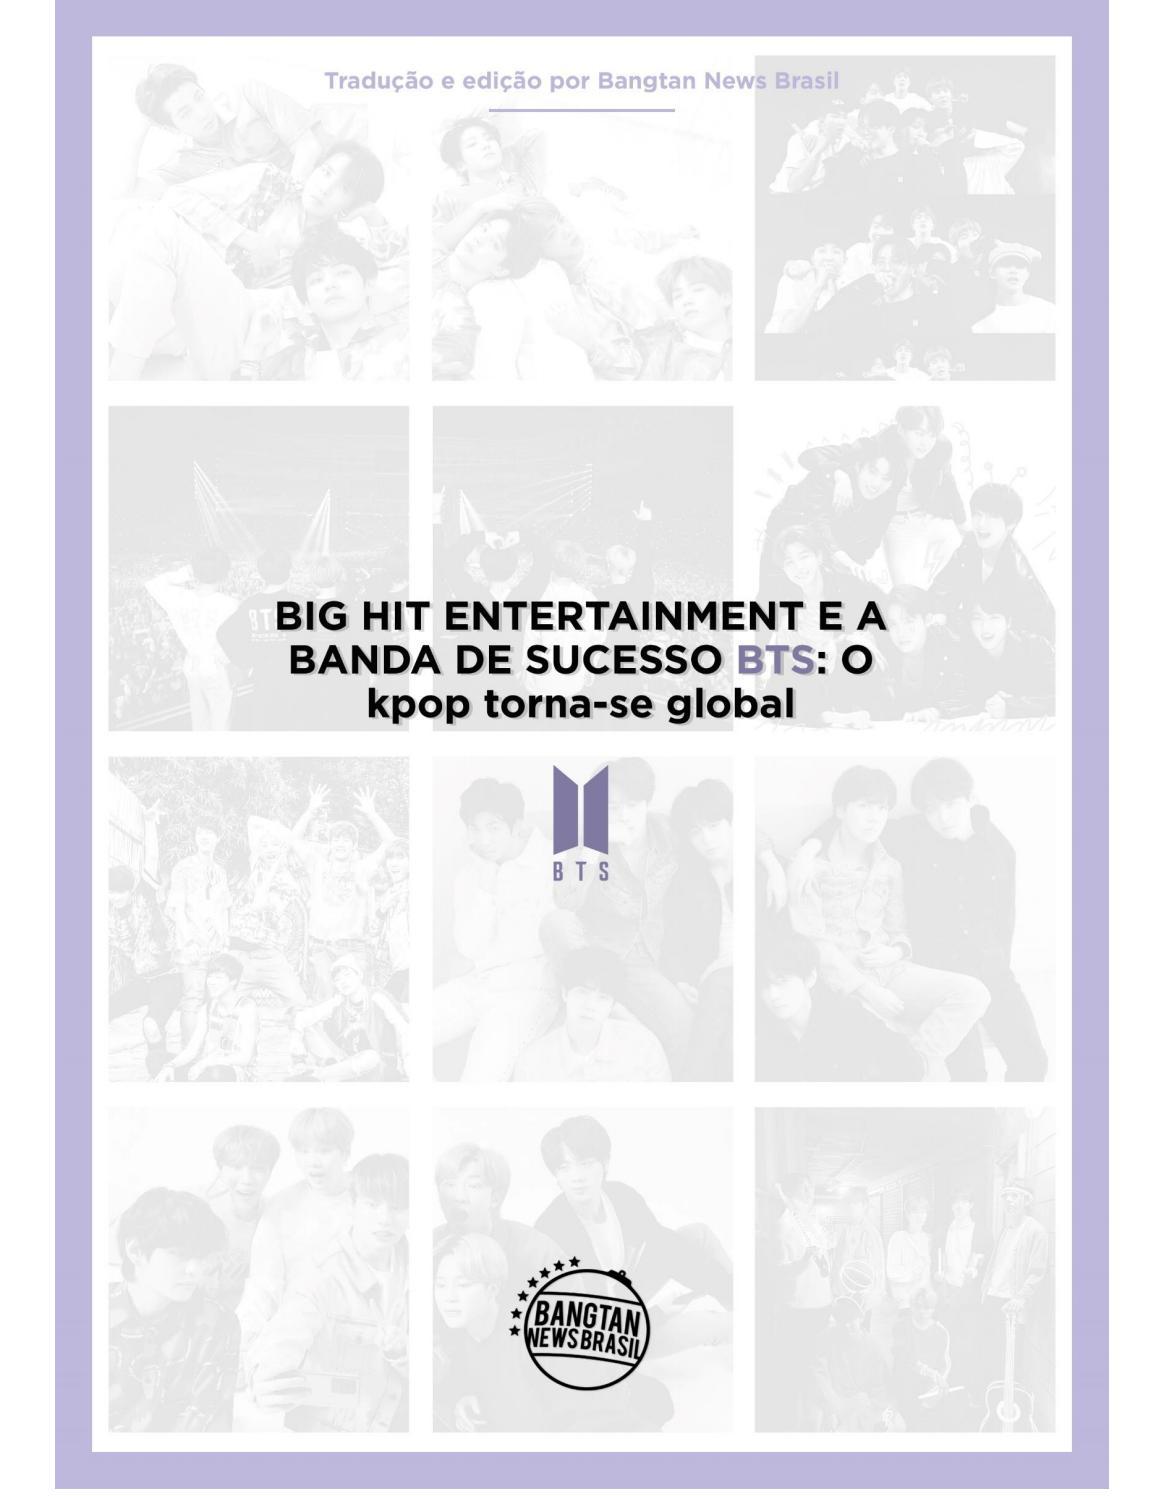 Big Hit Entertainment E A Banda De Sucesso Bts O Kpop Torna Se Global By Bangtan 7 Br Issuu